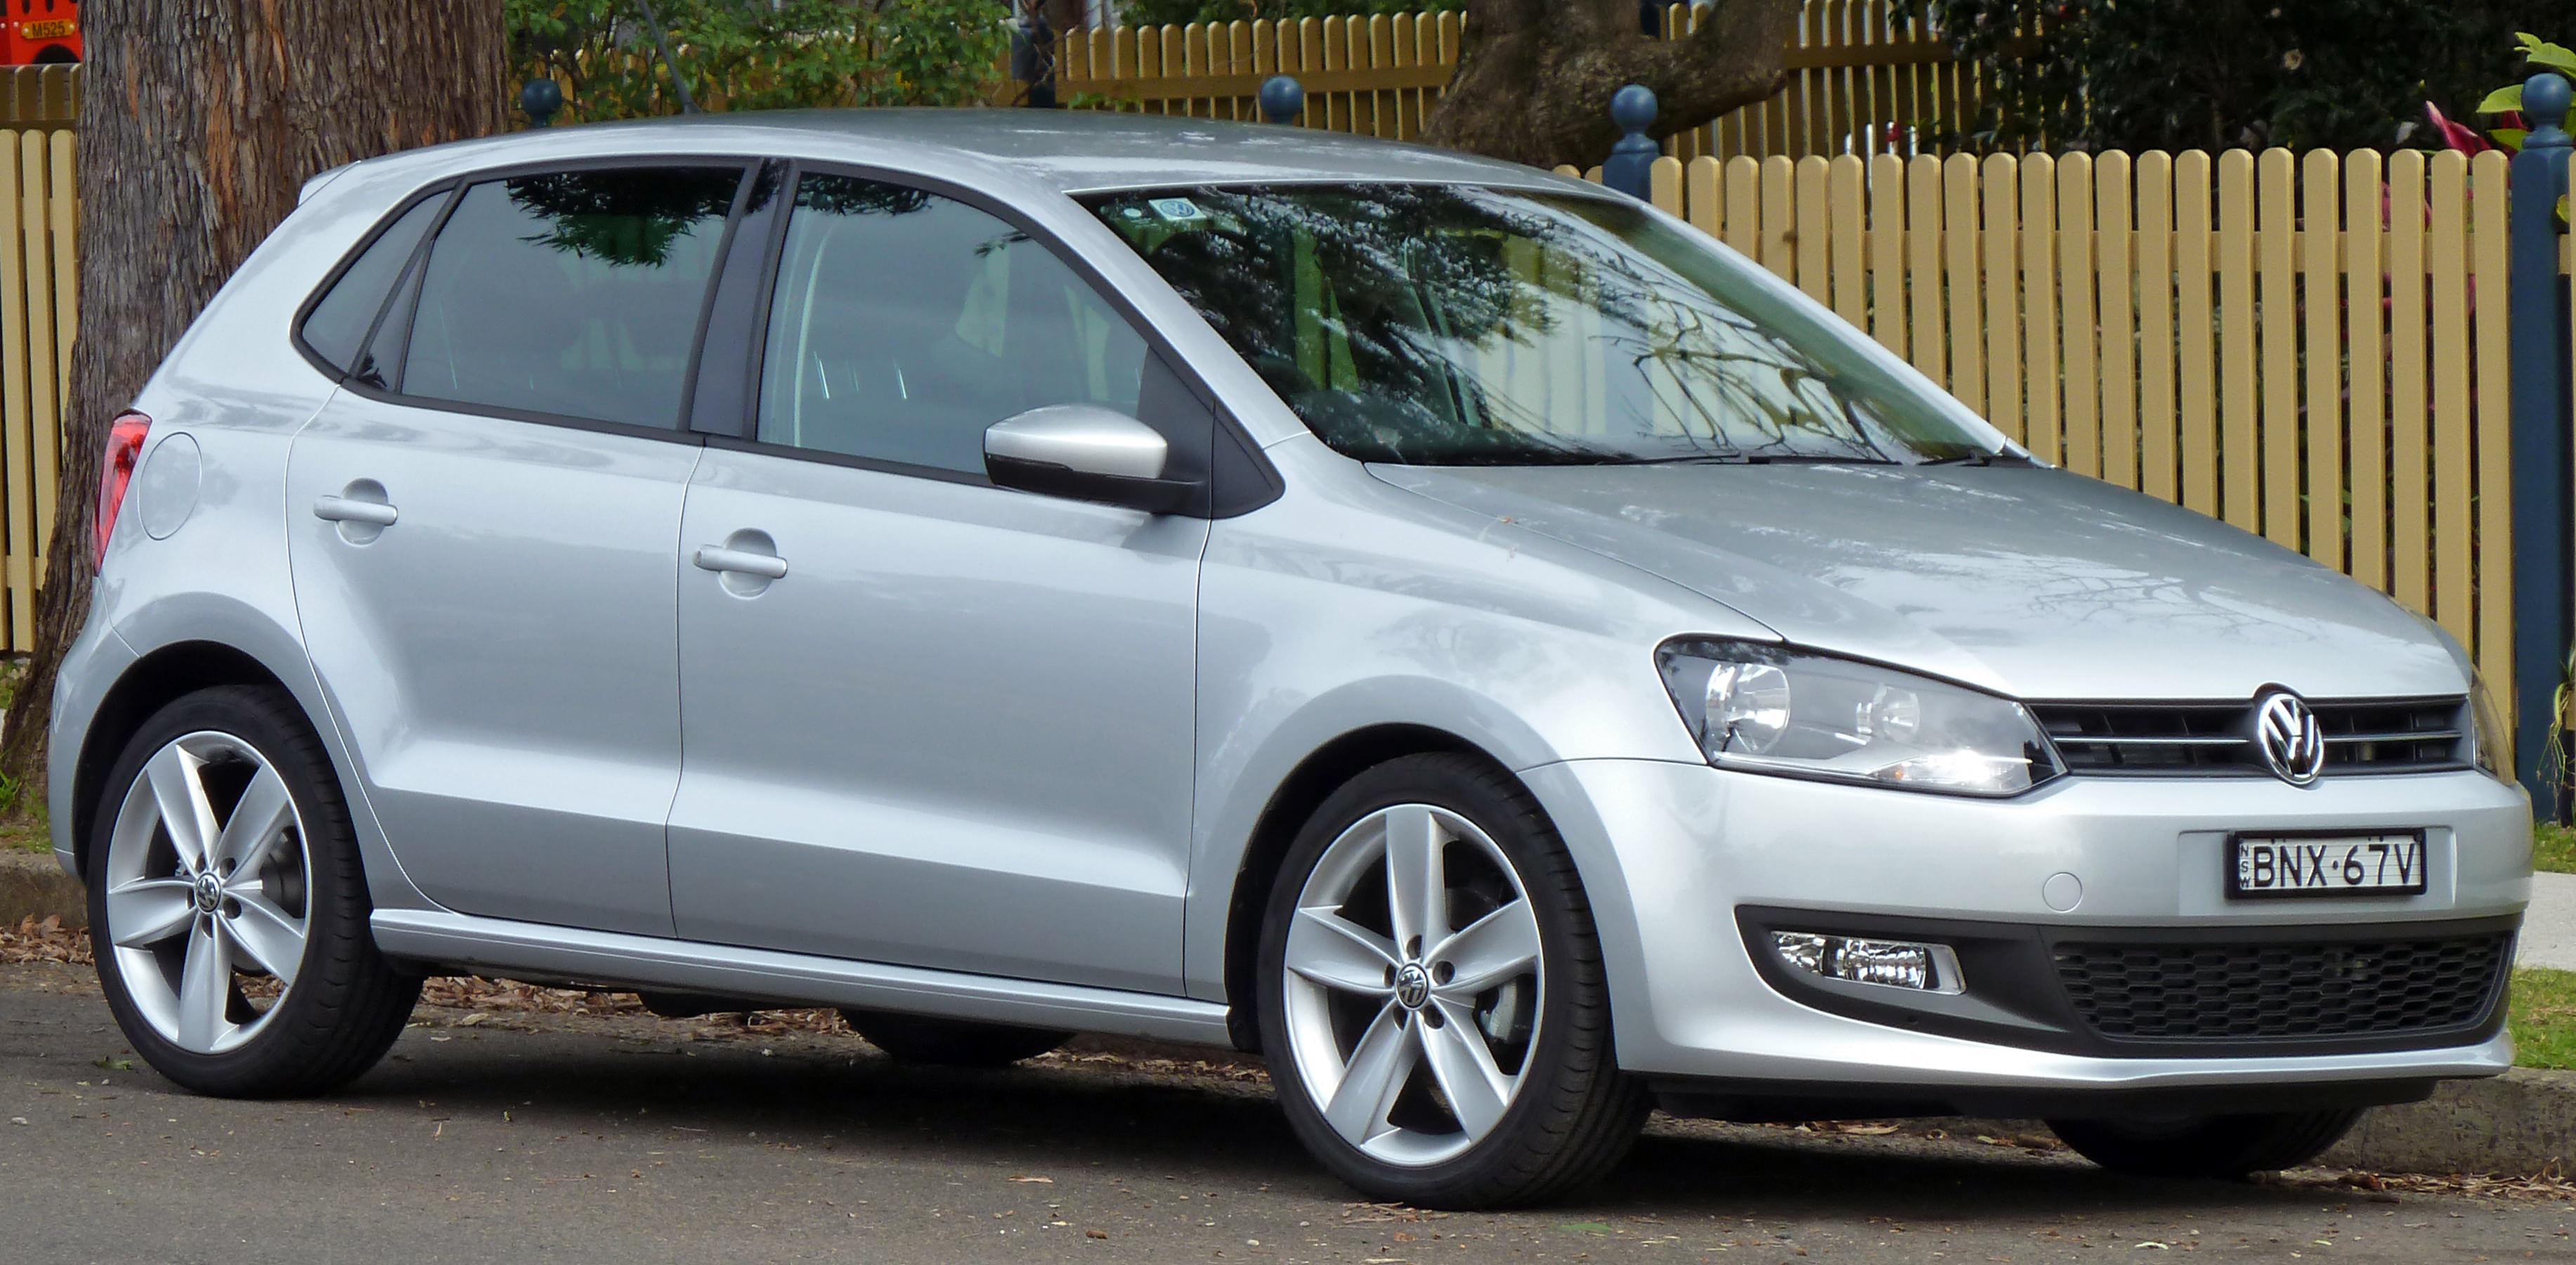 Volkswagen, Codacons chiede blocco vendita in Italia